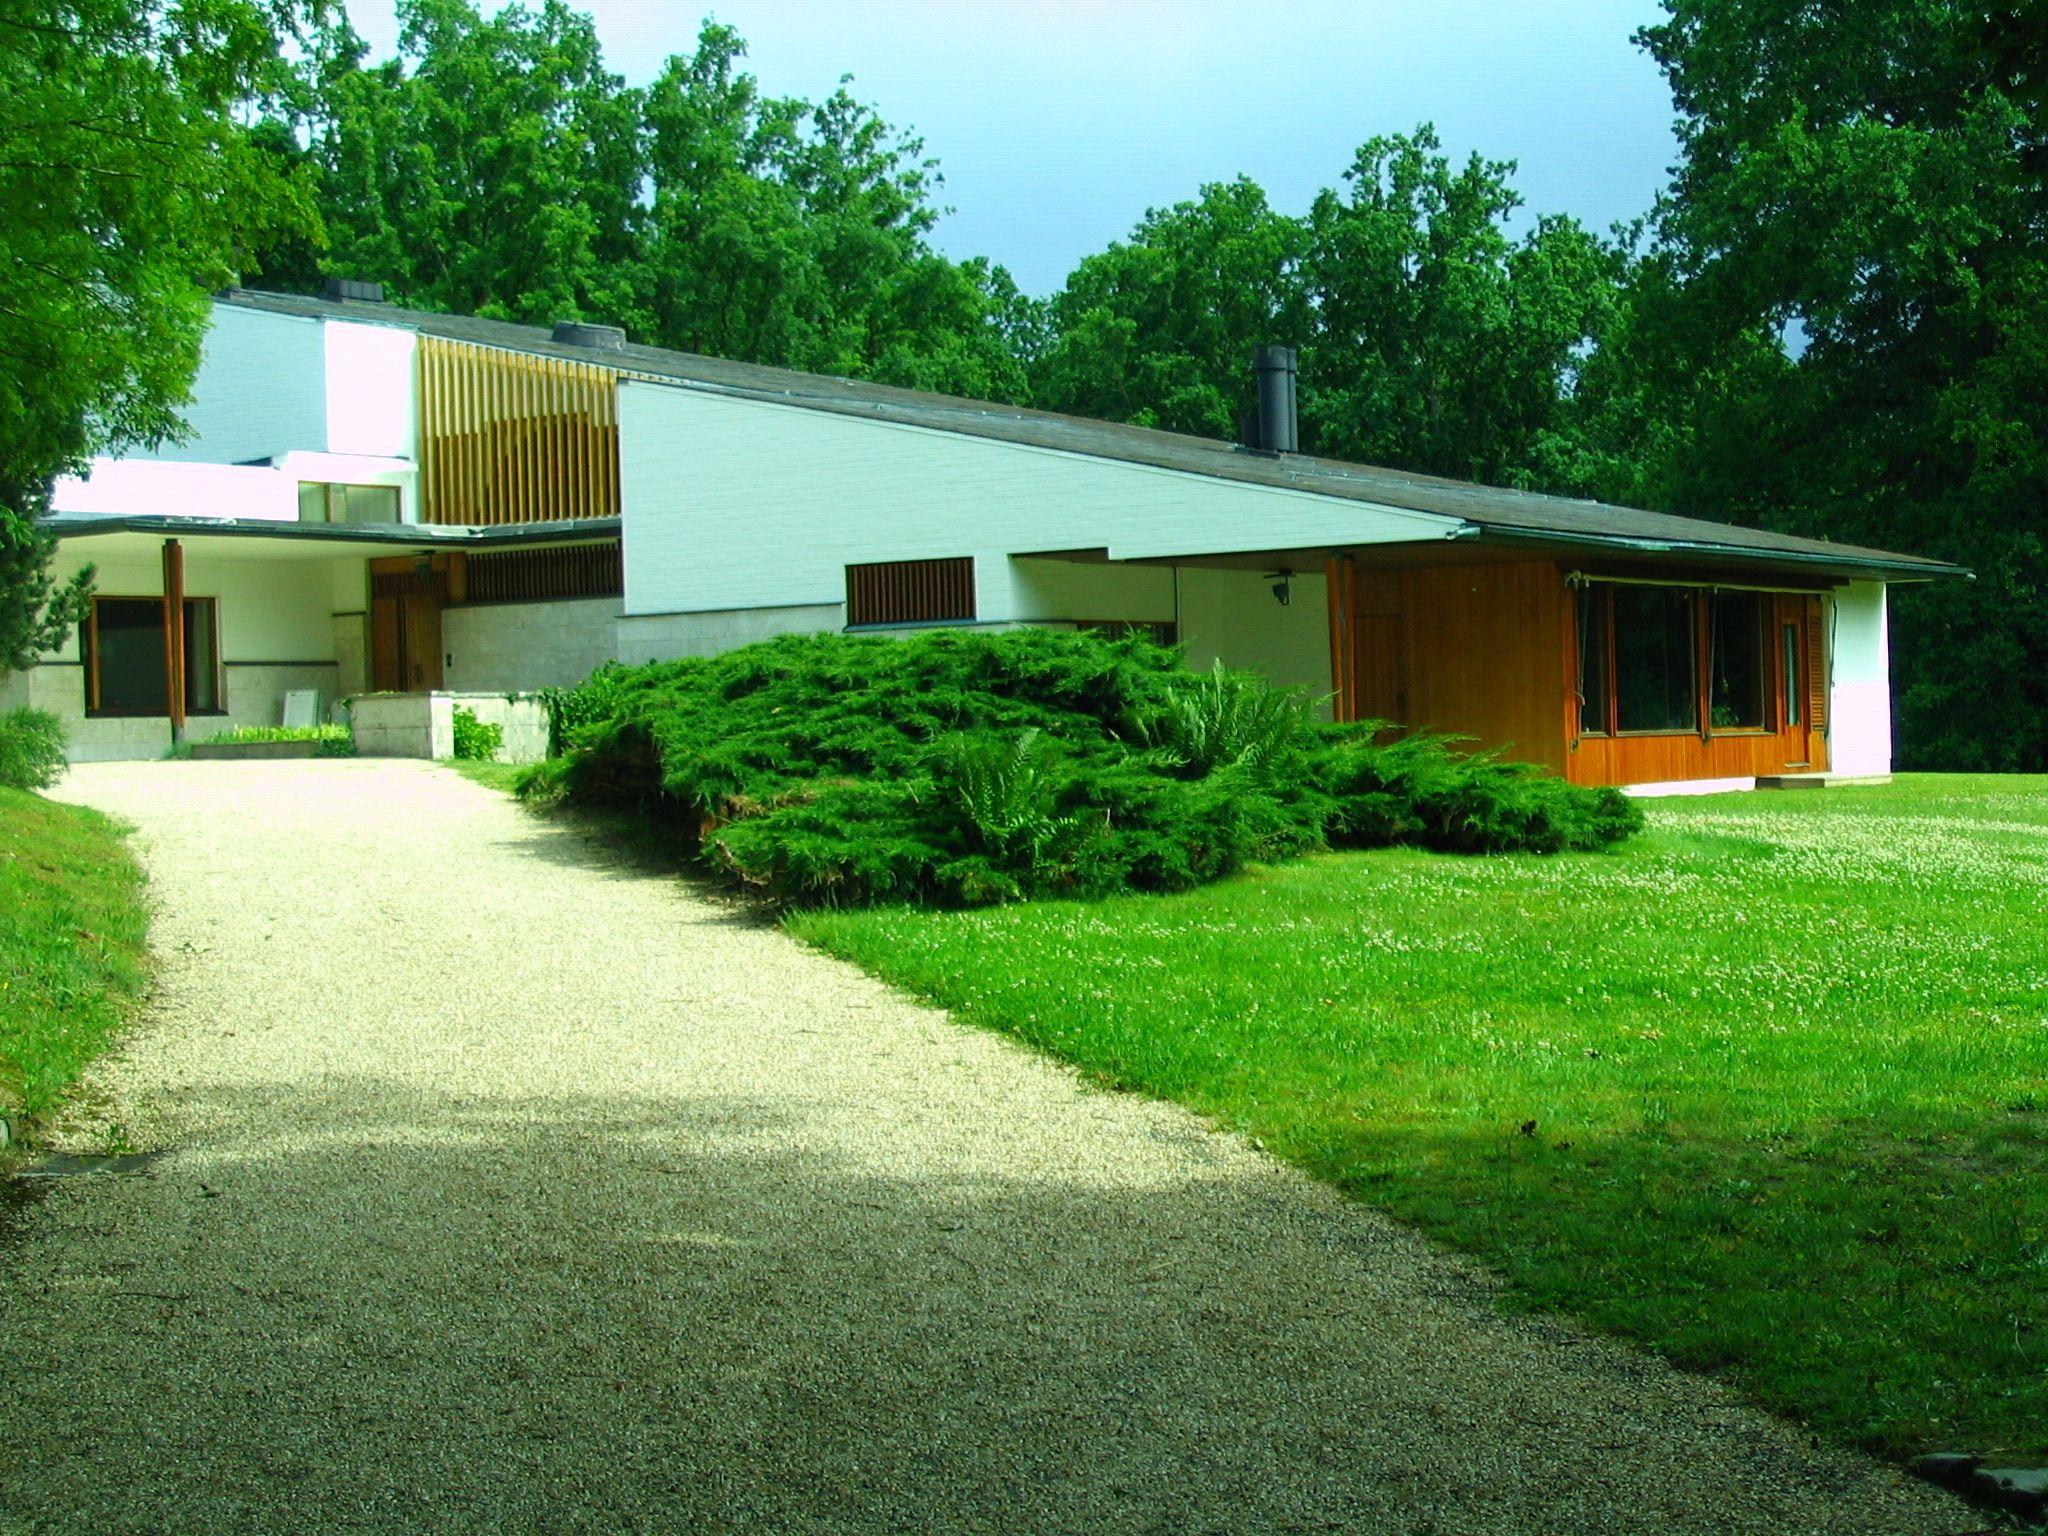 Maison carr alvar aalto google search arquitectura for Alvar aalto maison